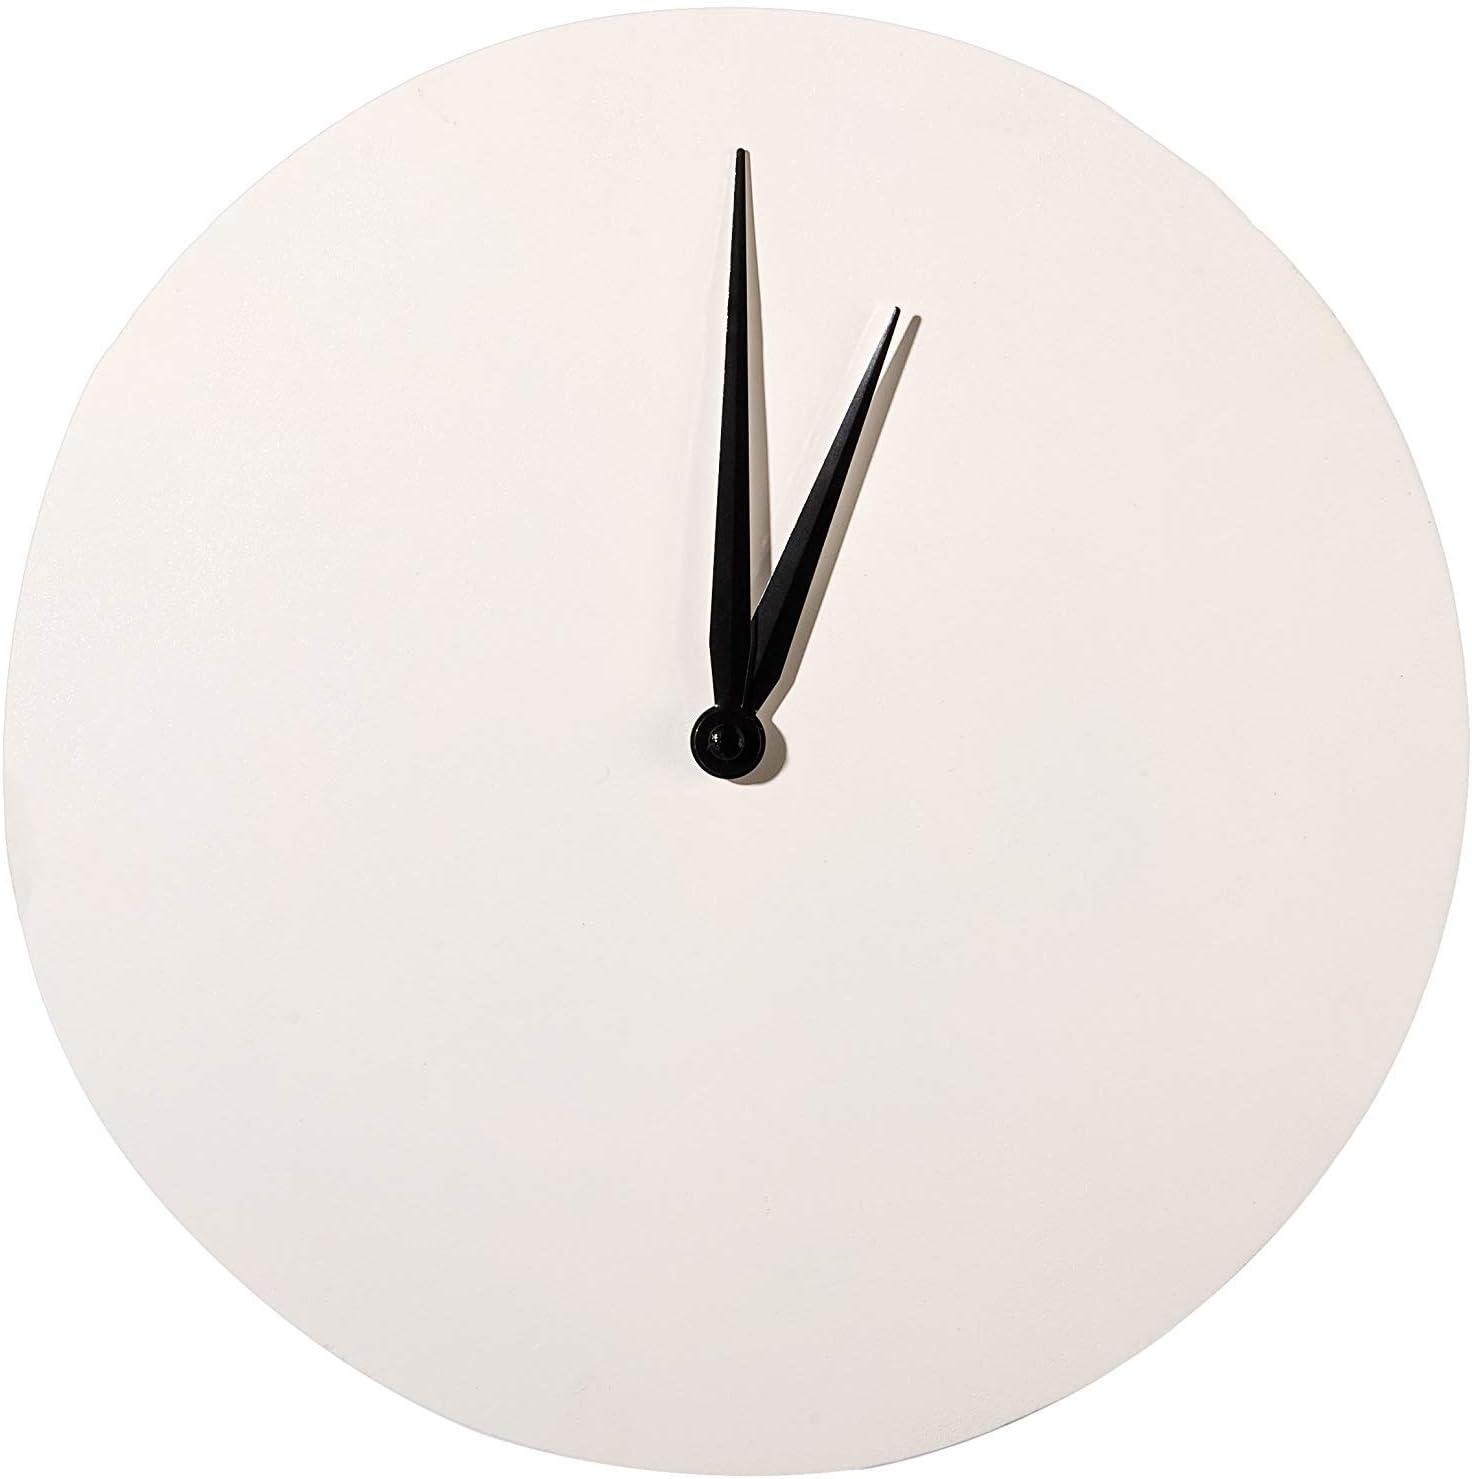 Glorex GmbH GLOREX Horloge Ronde en Bois FSC Naturel 30/x 30/x 2/cm